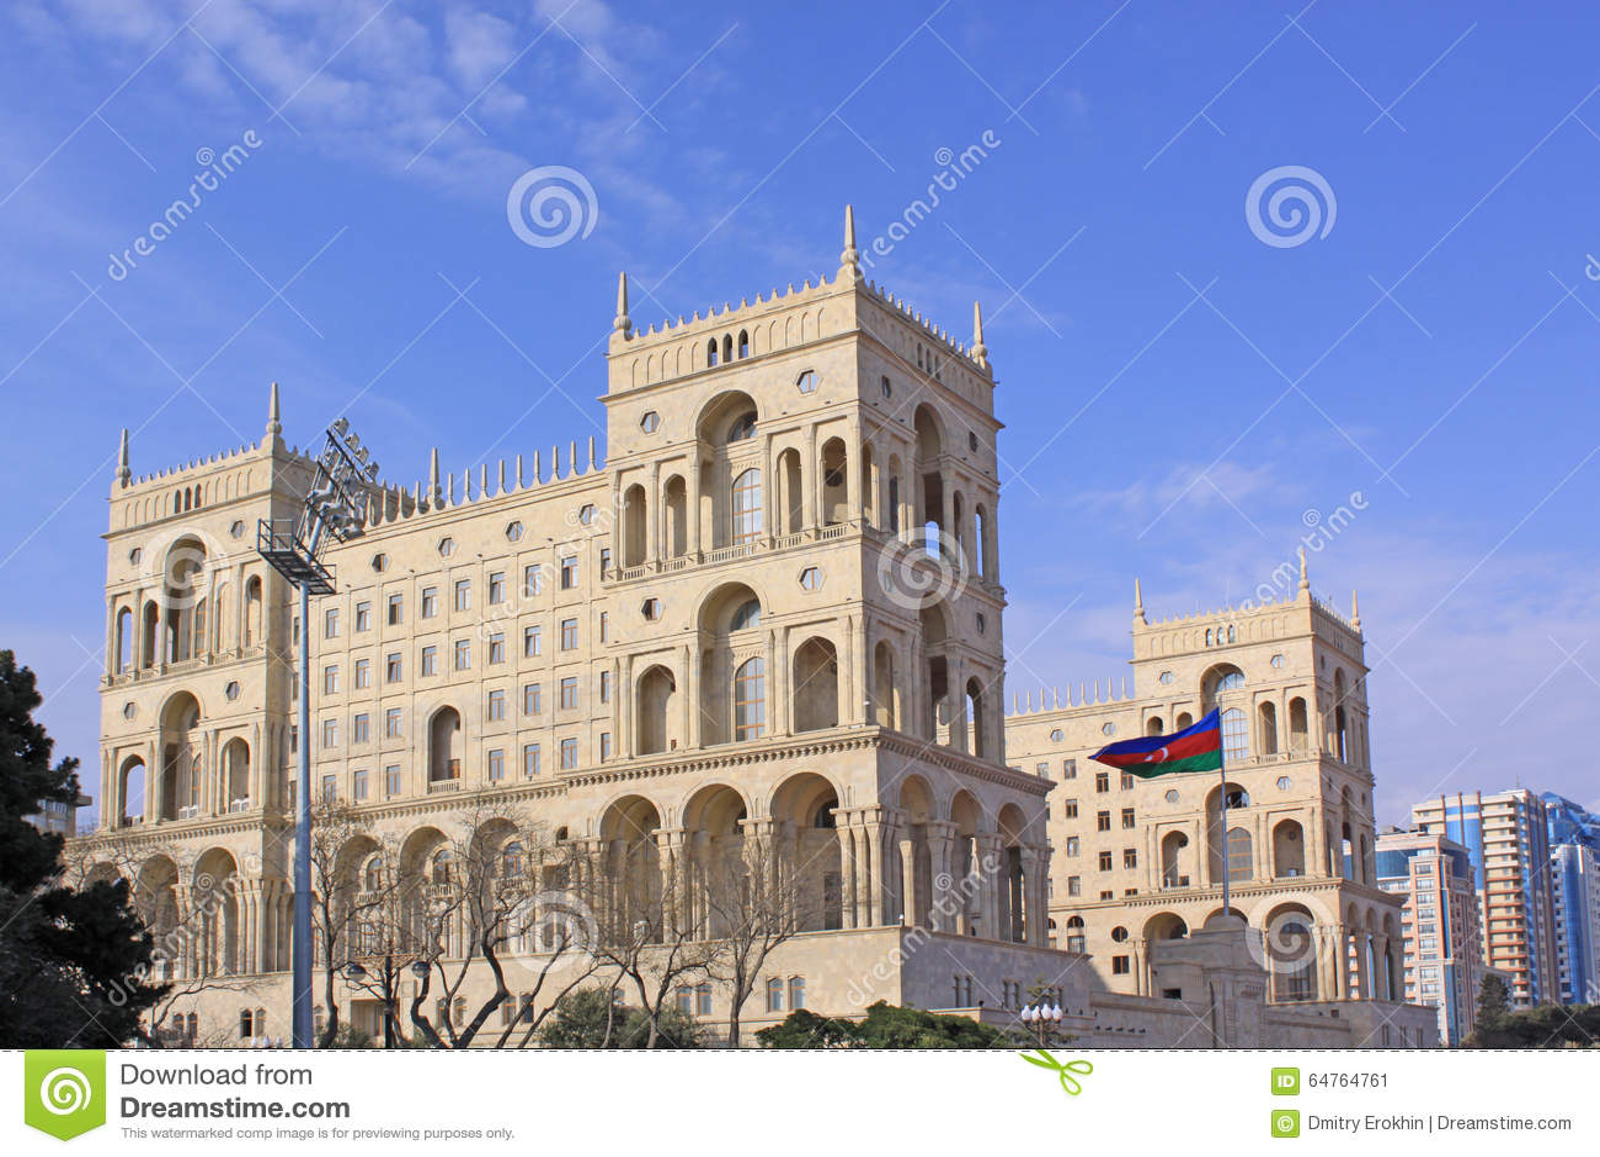 Azerbaijan: cities. Capital and major cities of Azerbaijan 57